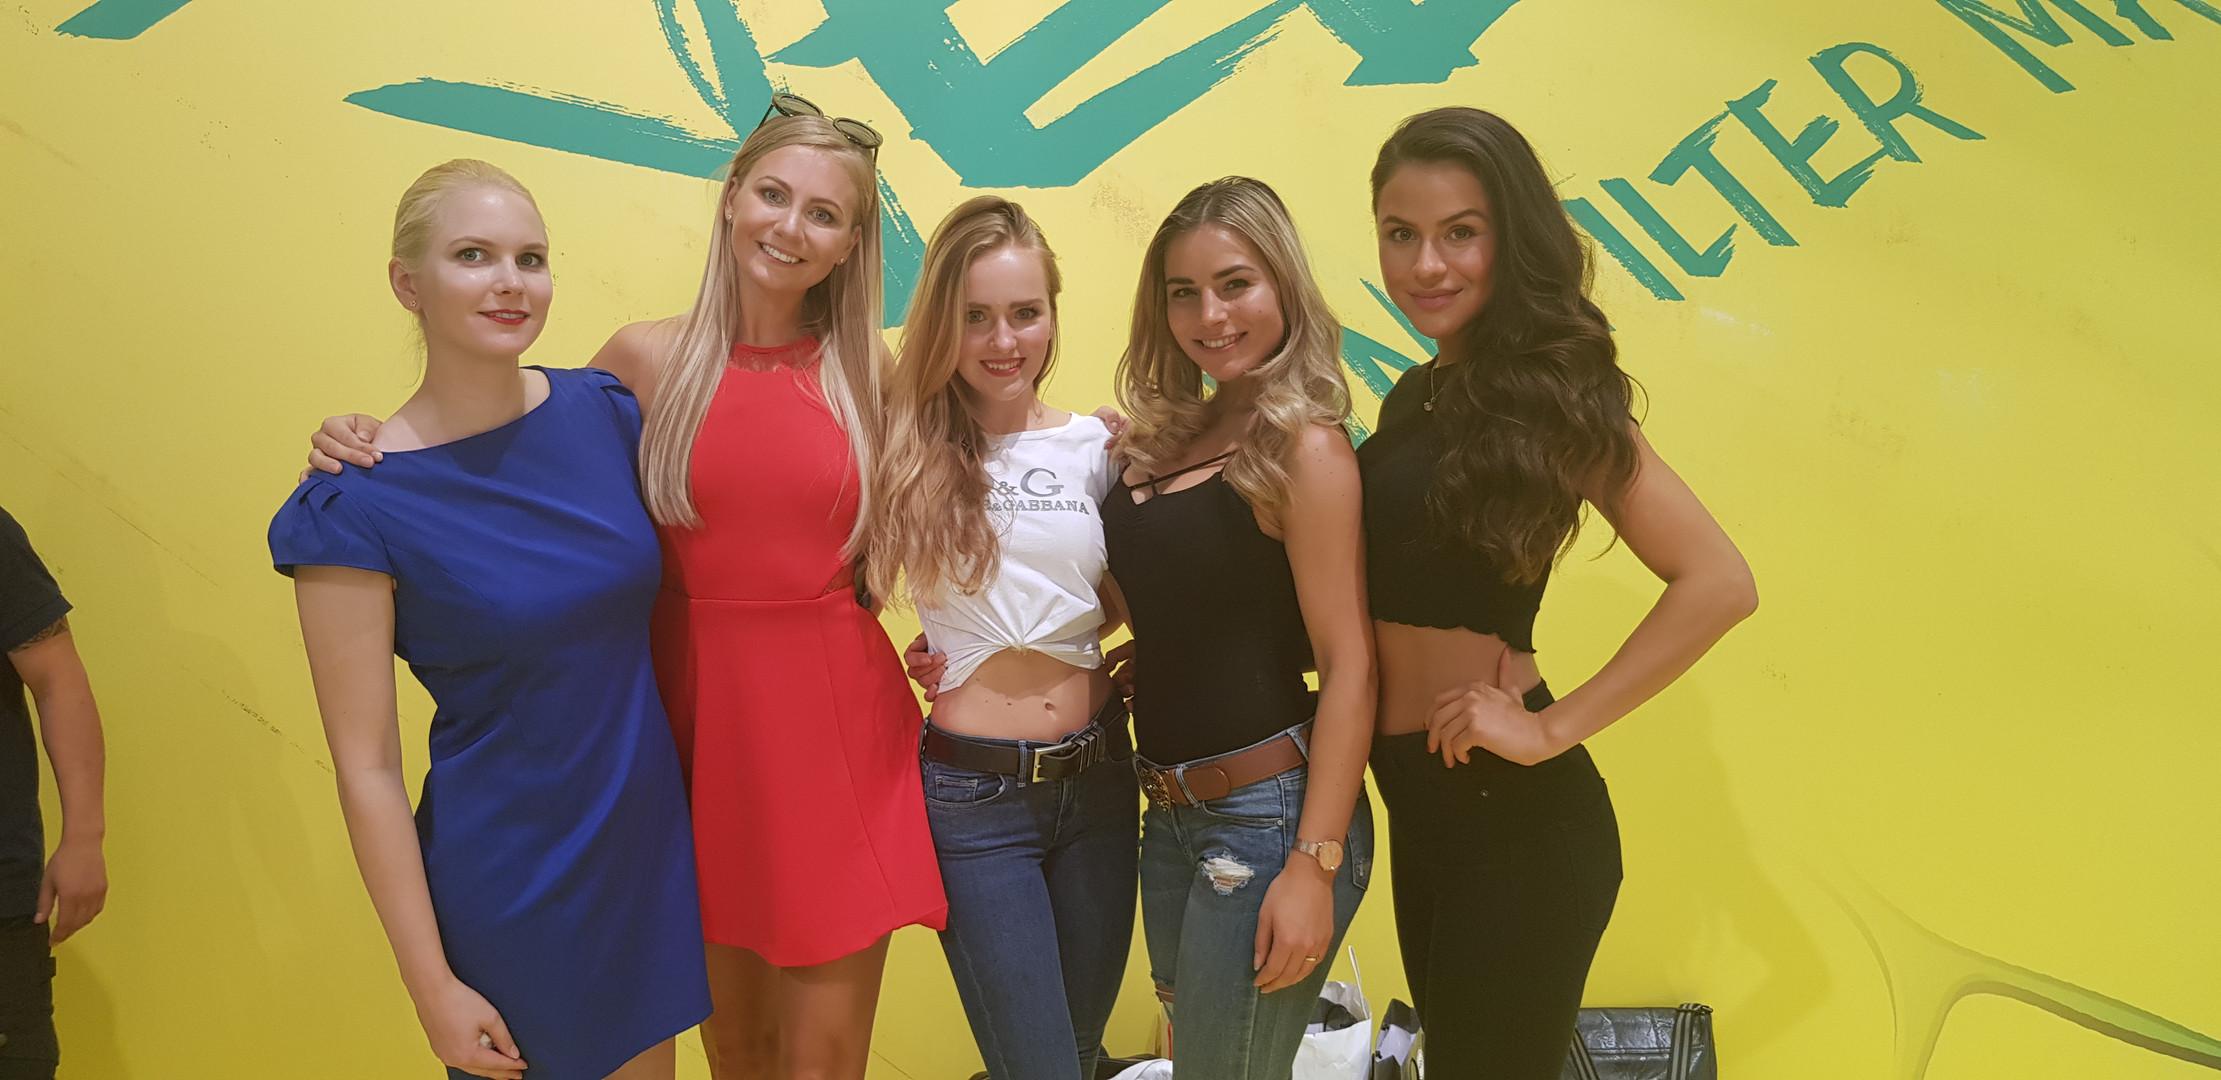 Sabine, Marie, Chantal, Viktoria, Laura